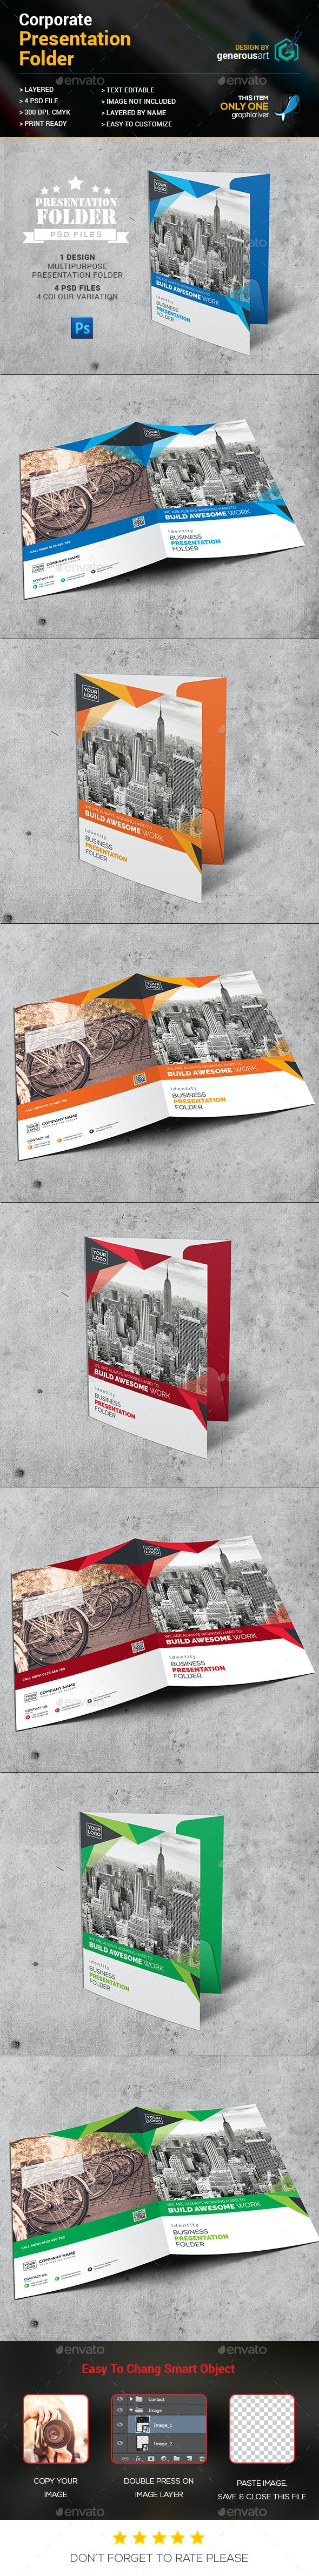 Pro Presentation Folder - Stationery Print Templates